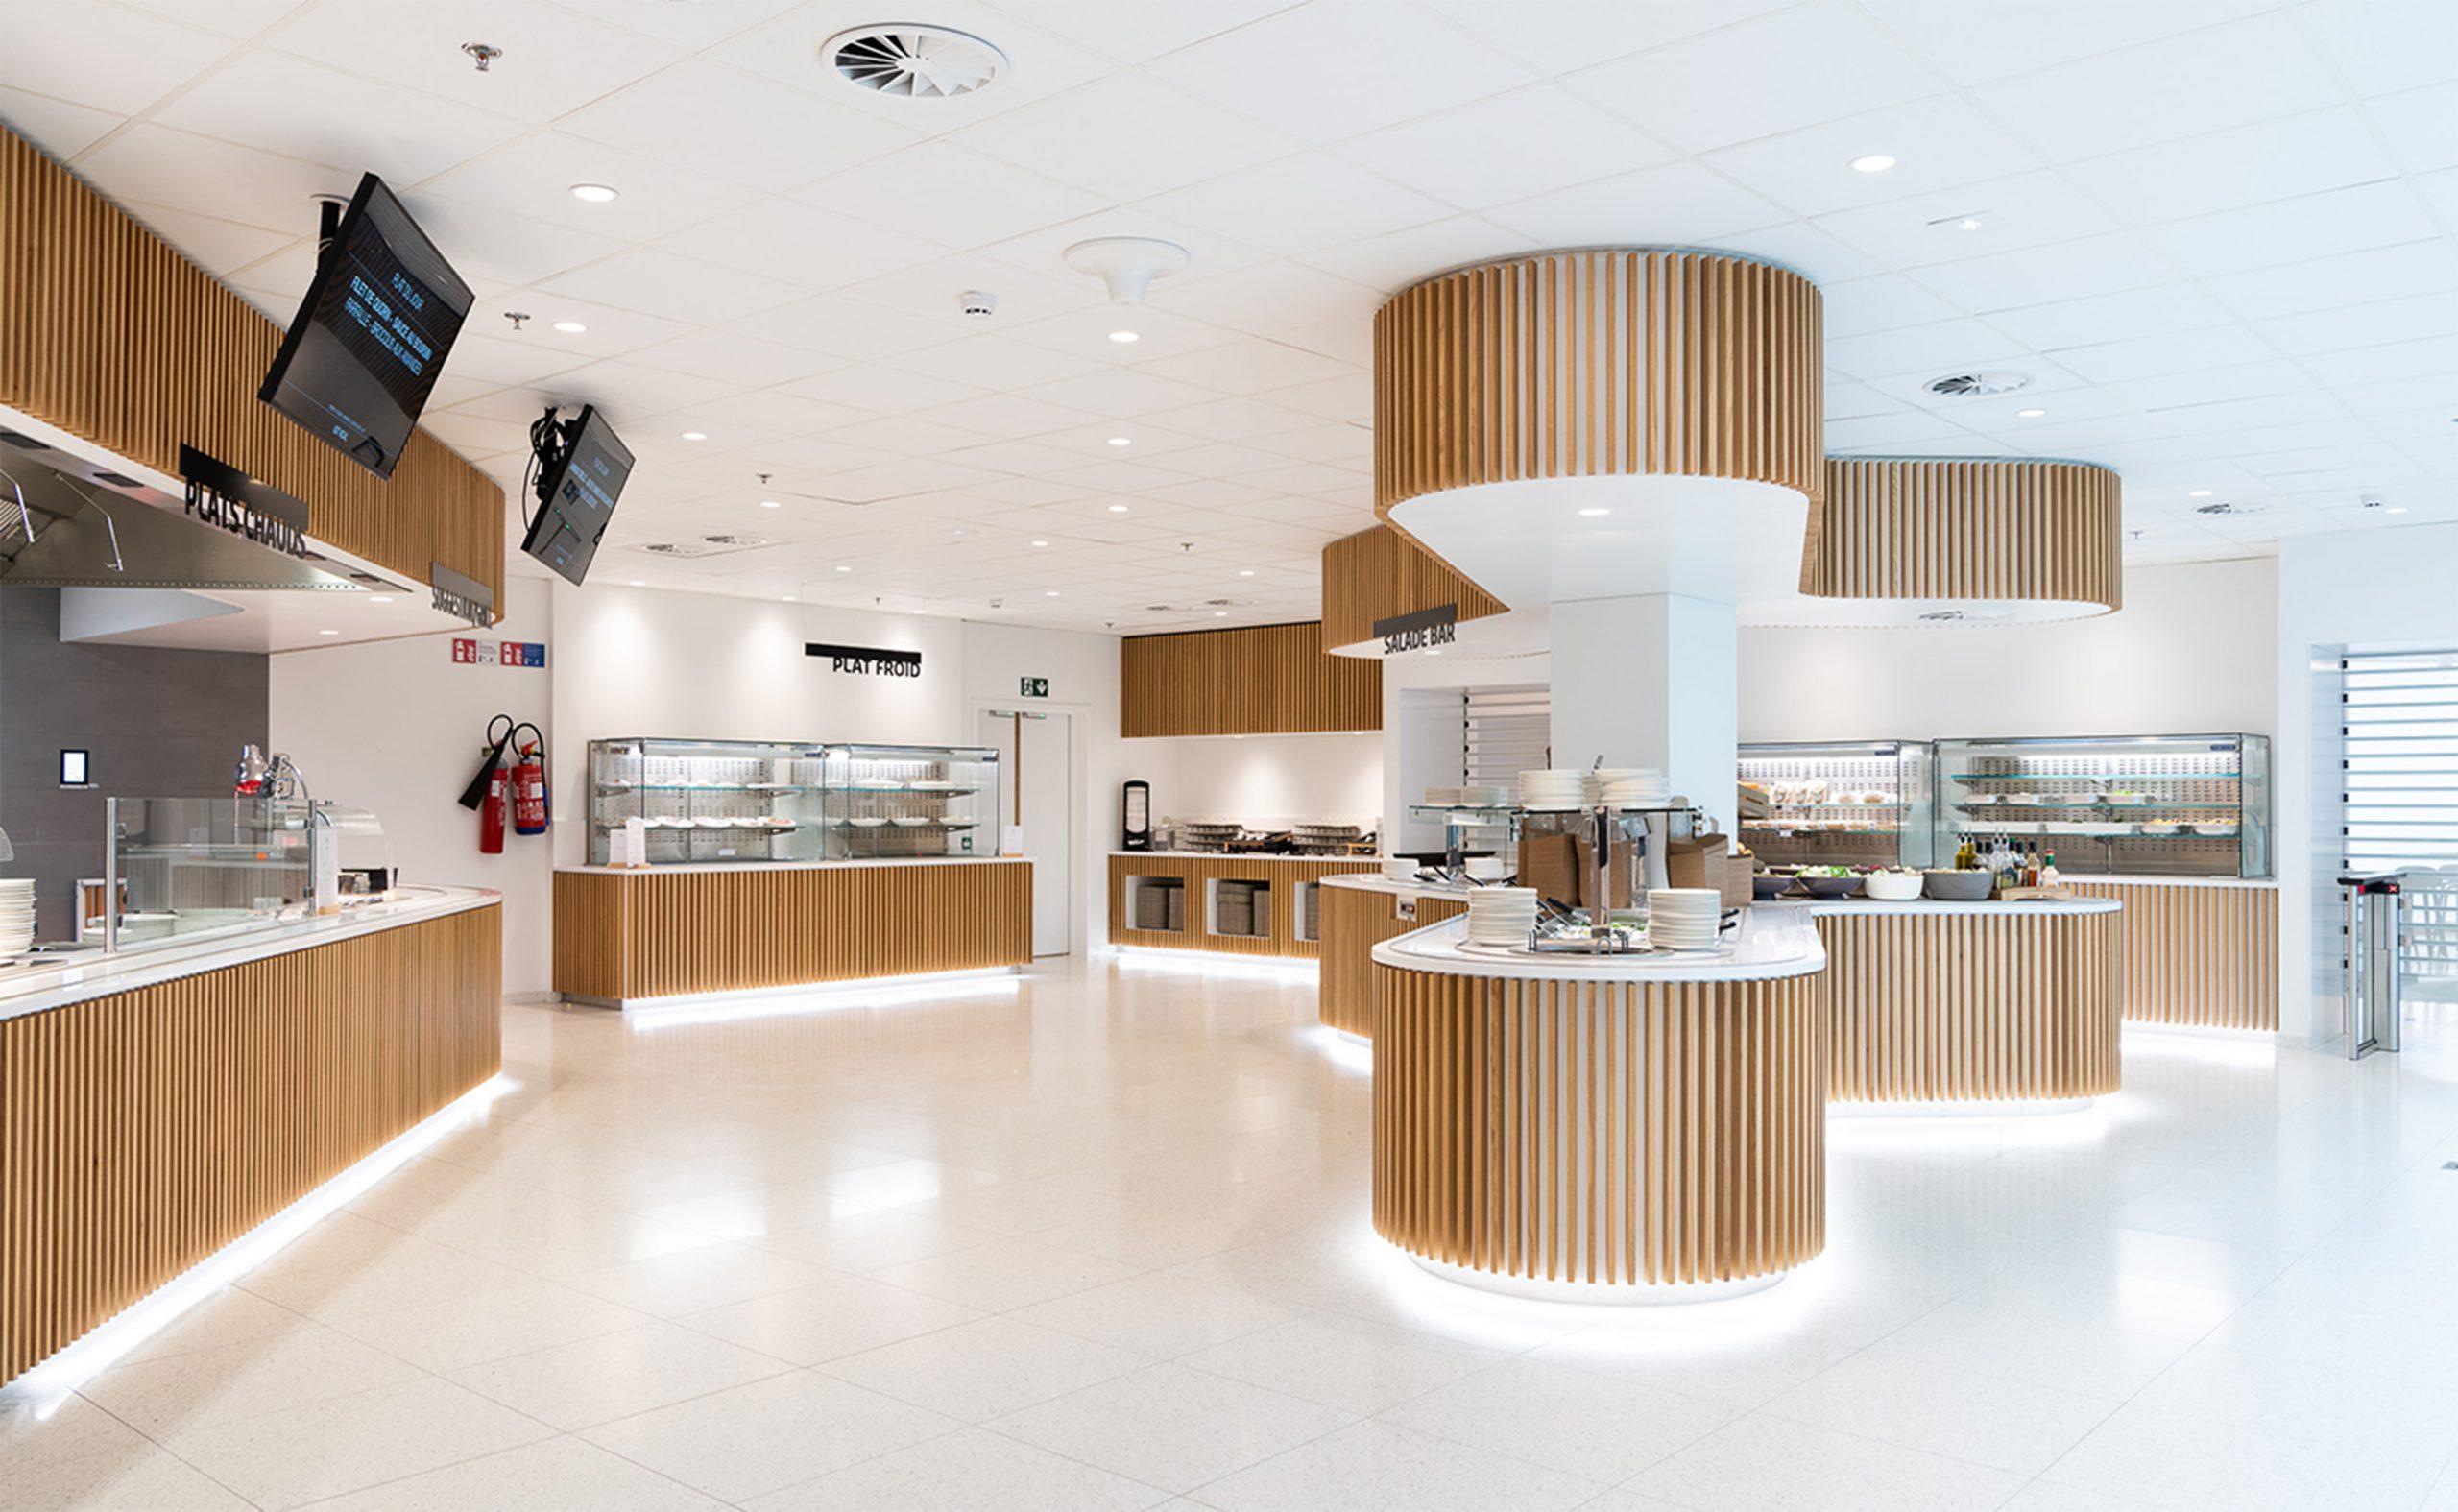 The new Delta hospital employee restaurant by ncbham